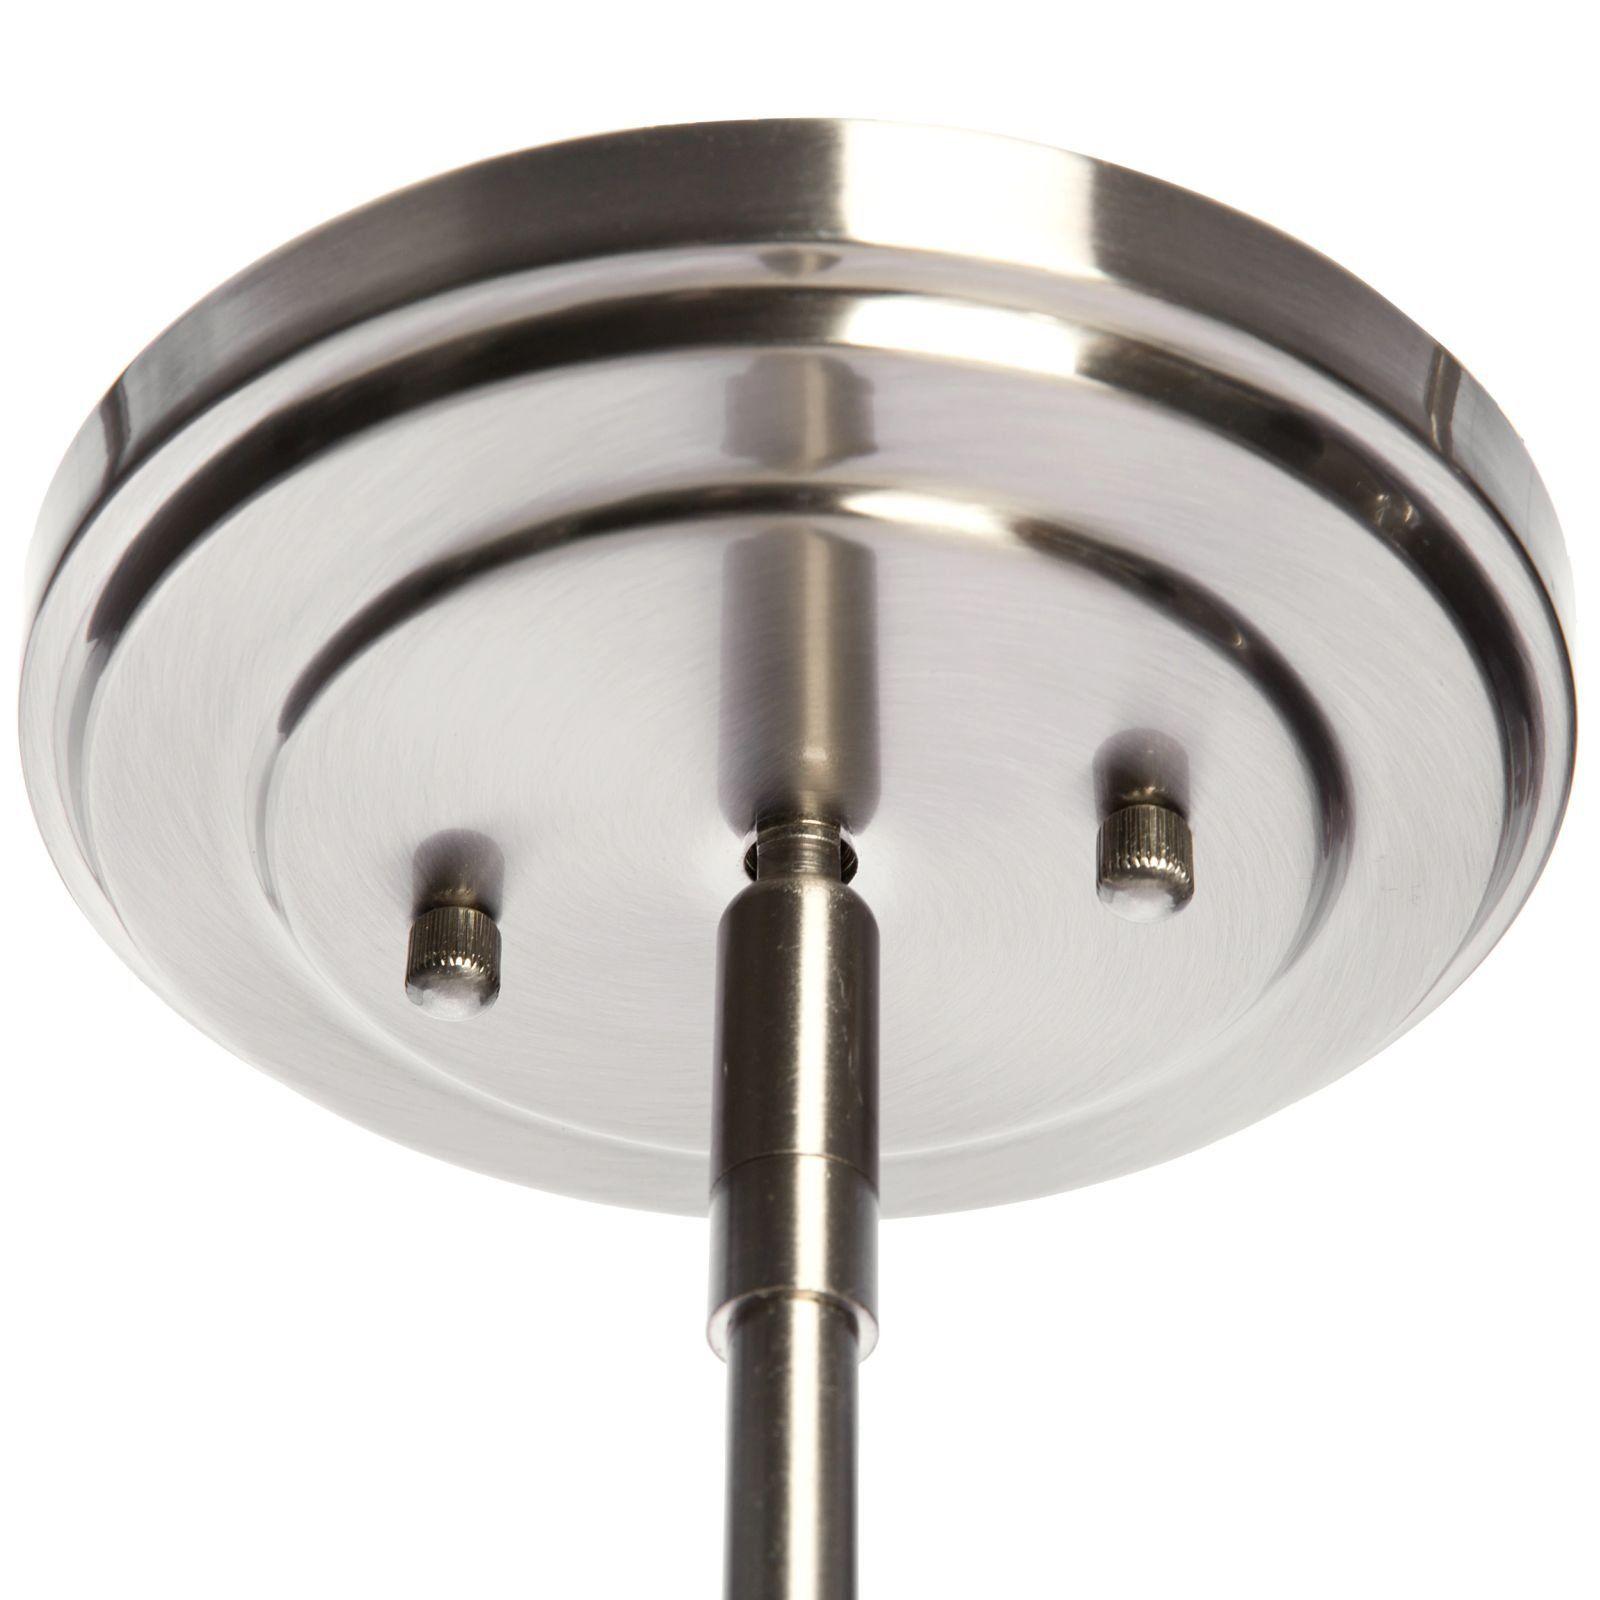 Capiz Chandelier Centerpiece Suitable For High And Low Ceiling Rooms Brushed Nicke Brushed Nickel Pendant Lights Pendant Light Fixtures Chandelier Centerpiece